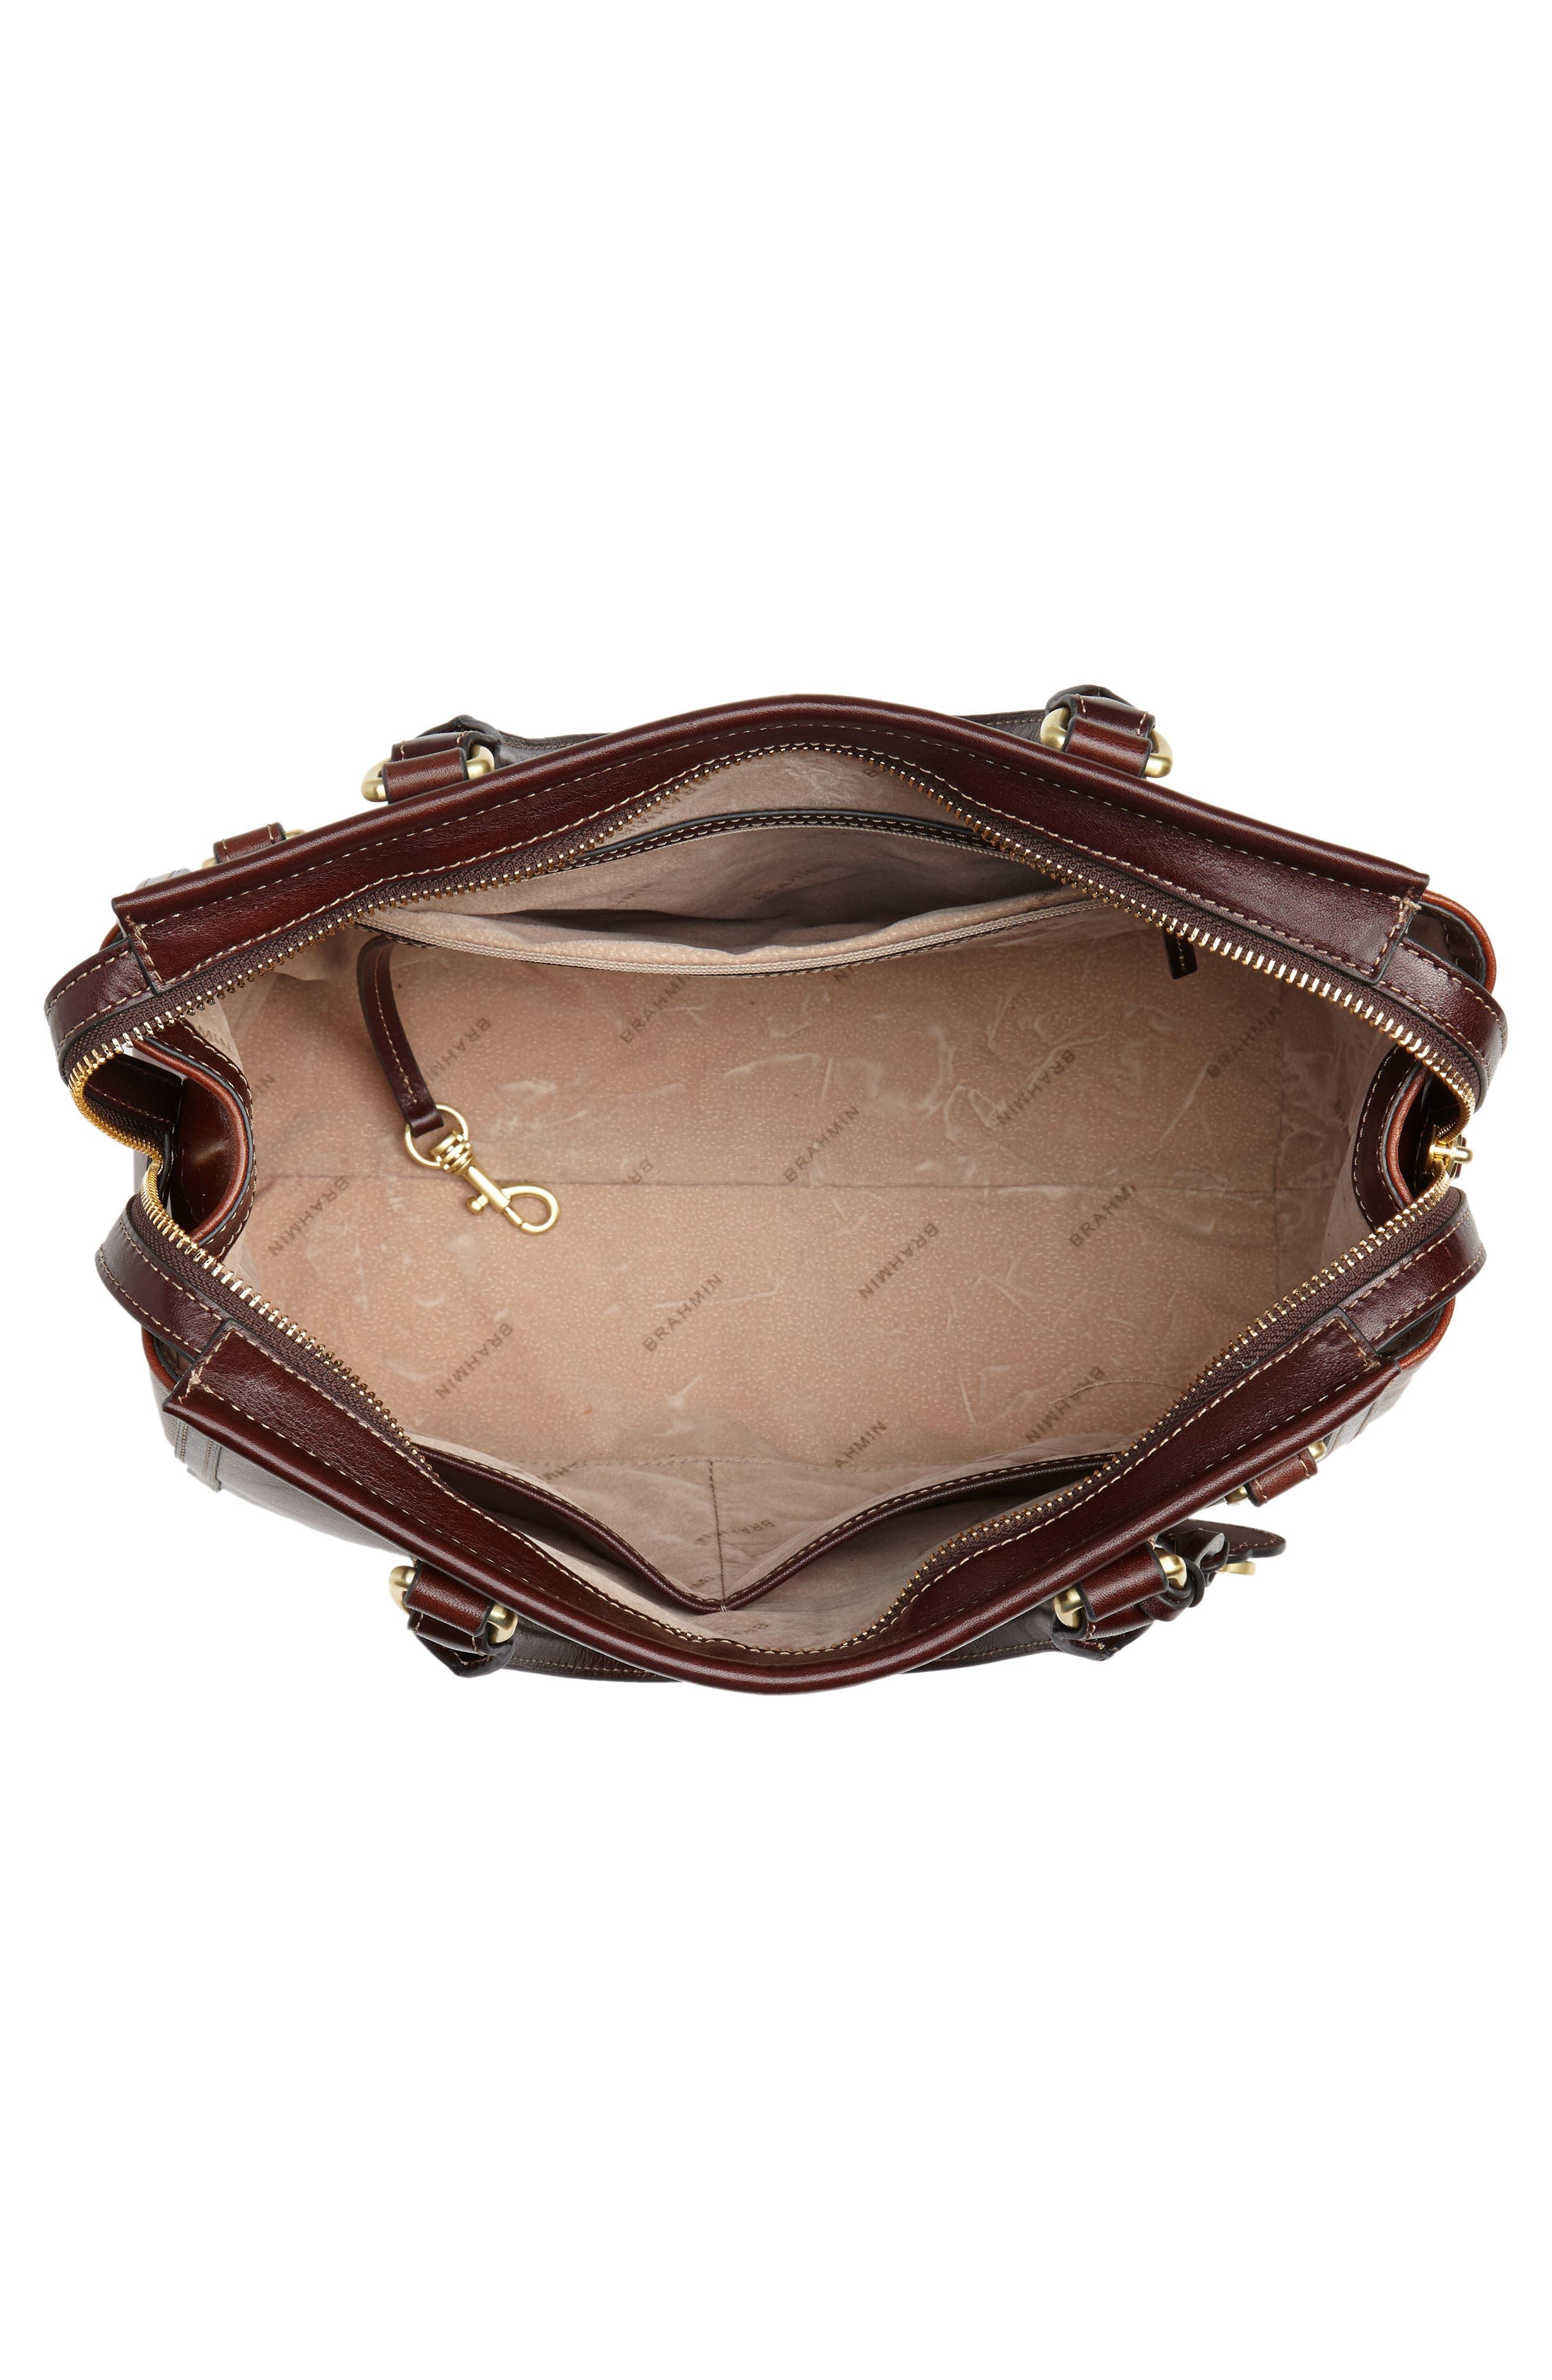 Schooner Leather Satchel,                             Alternate thumbnail 4, color,                             200